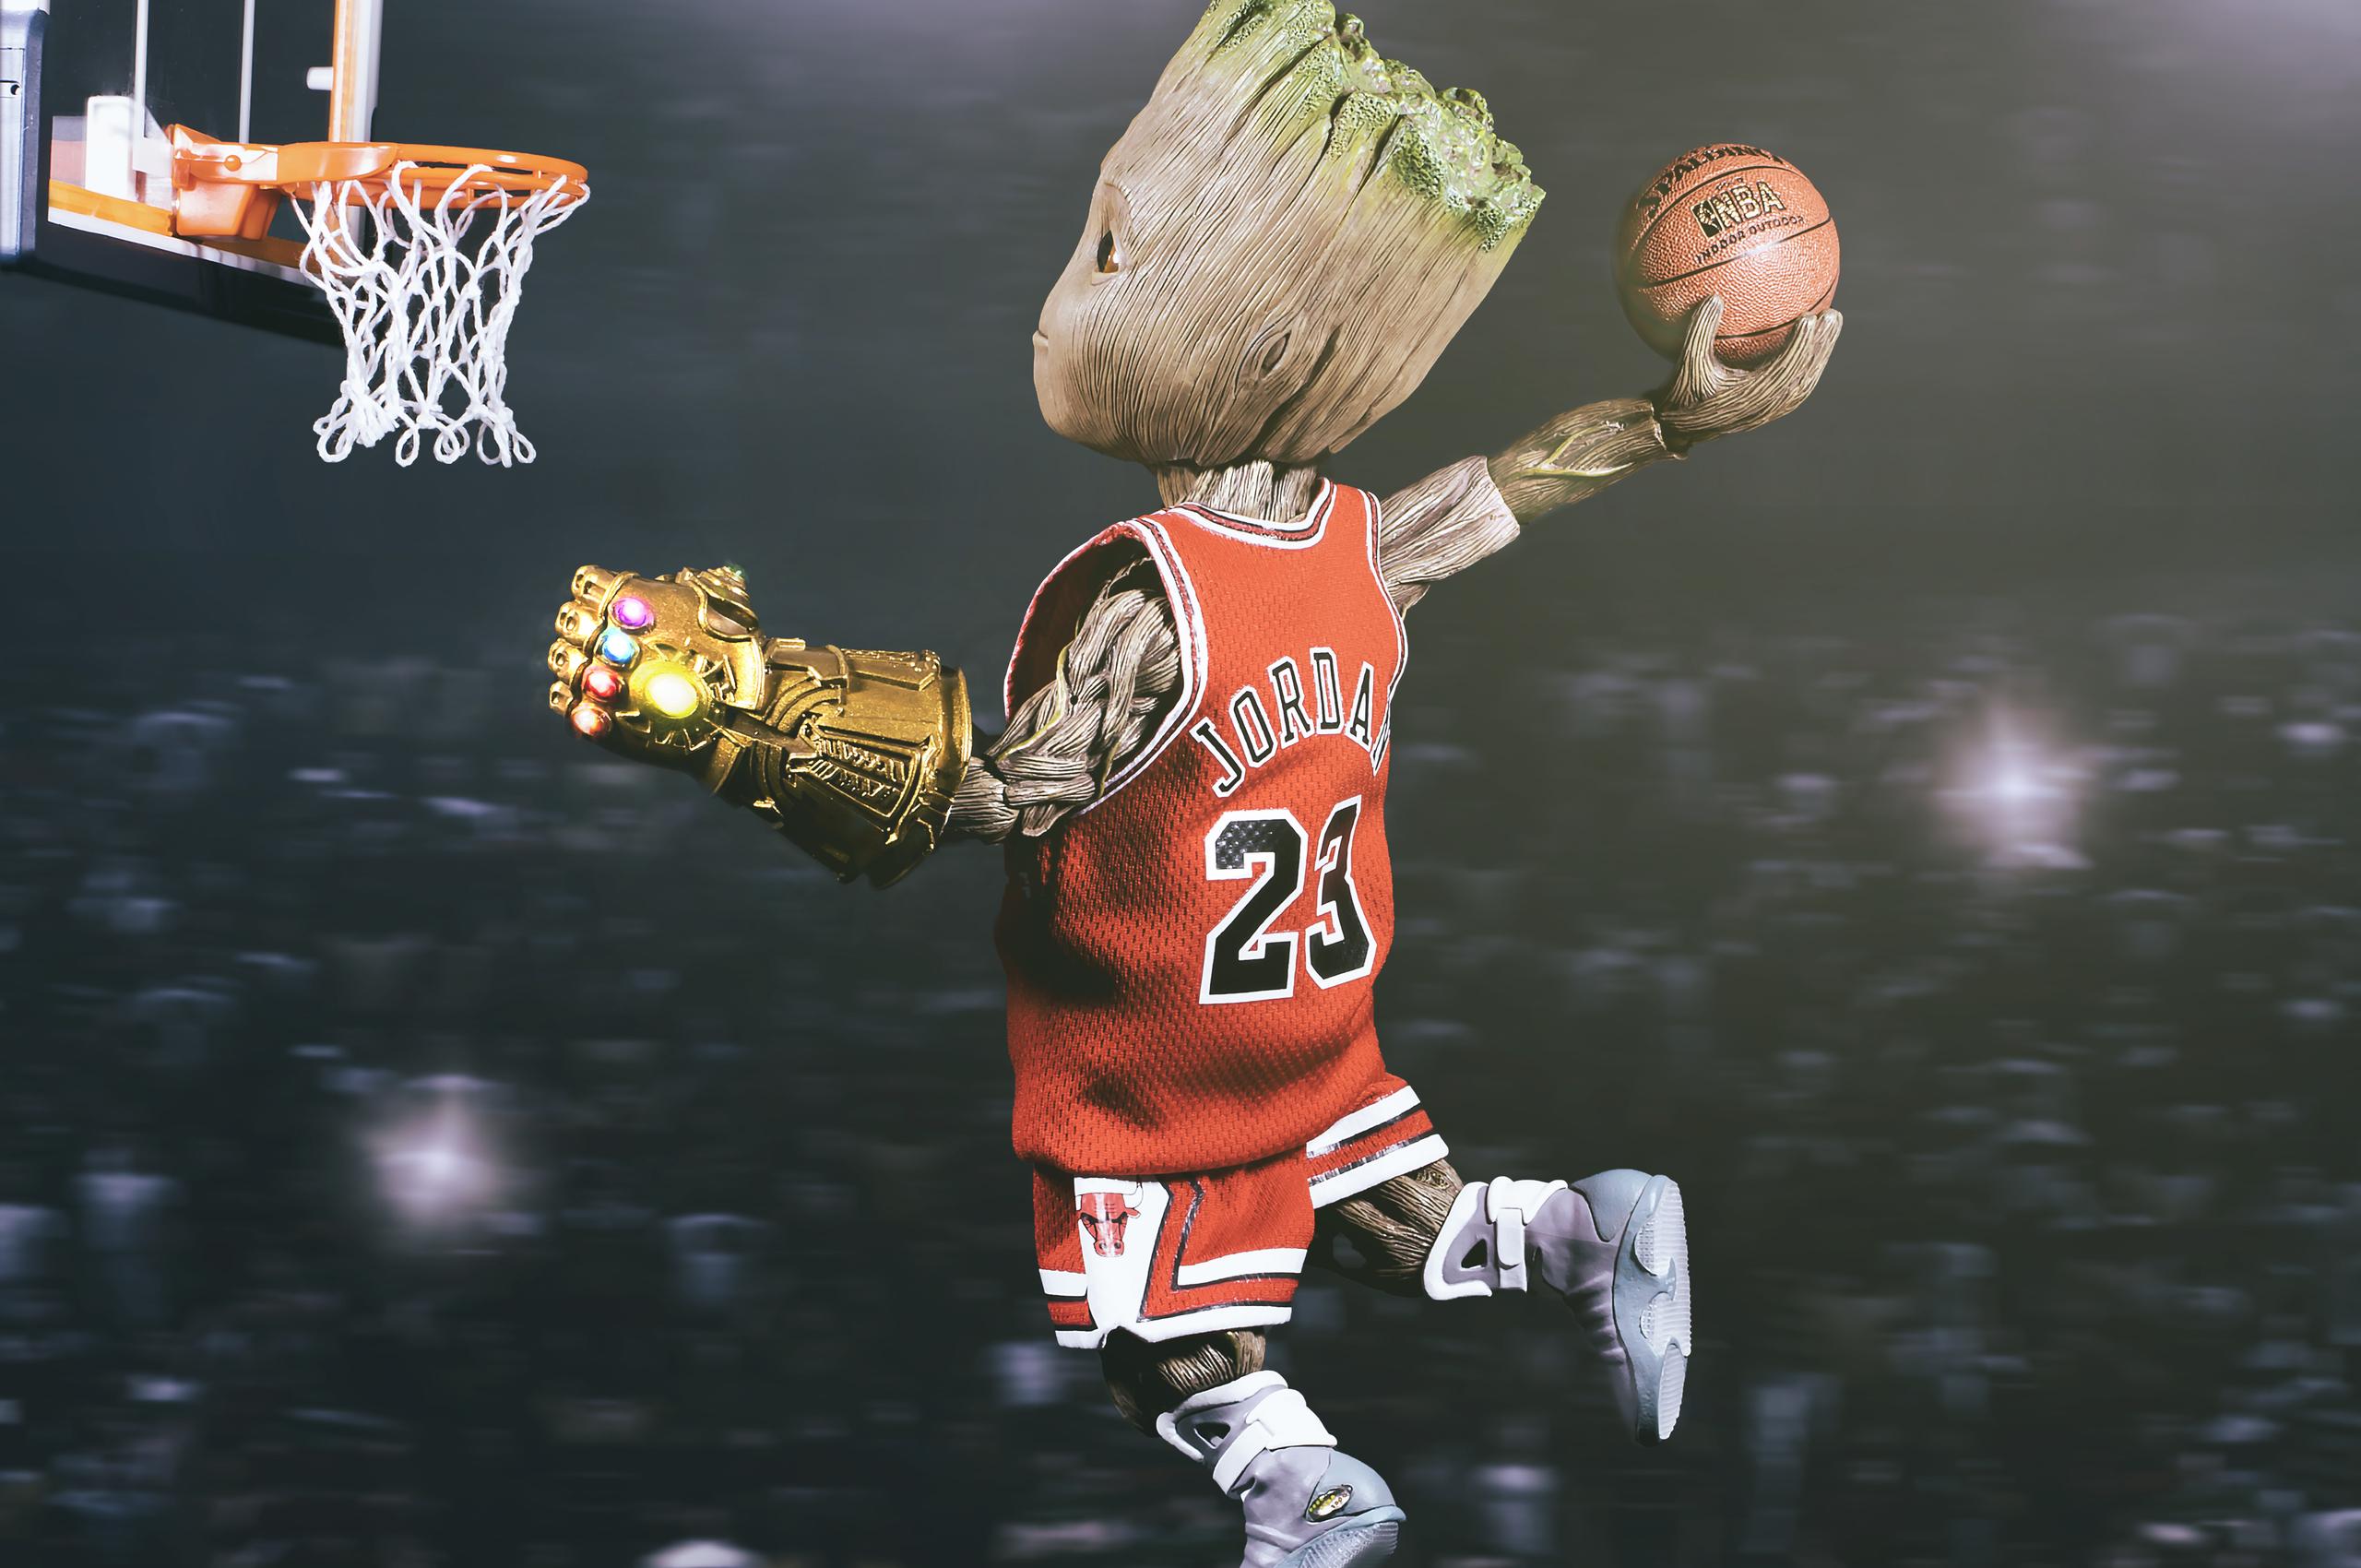 2560x1700 Baby Groot Playing Basketball Chromebook Pixel Hd 4k